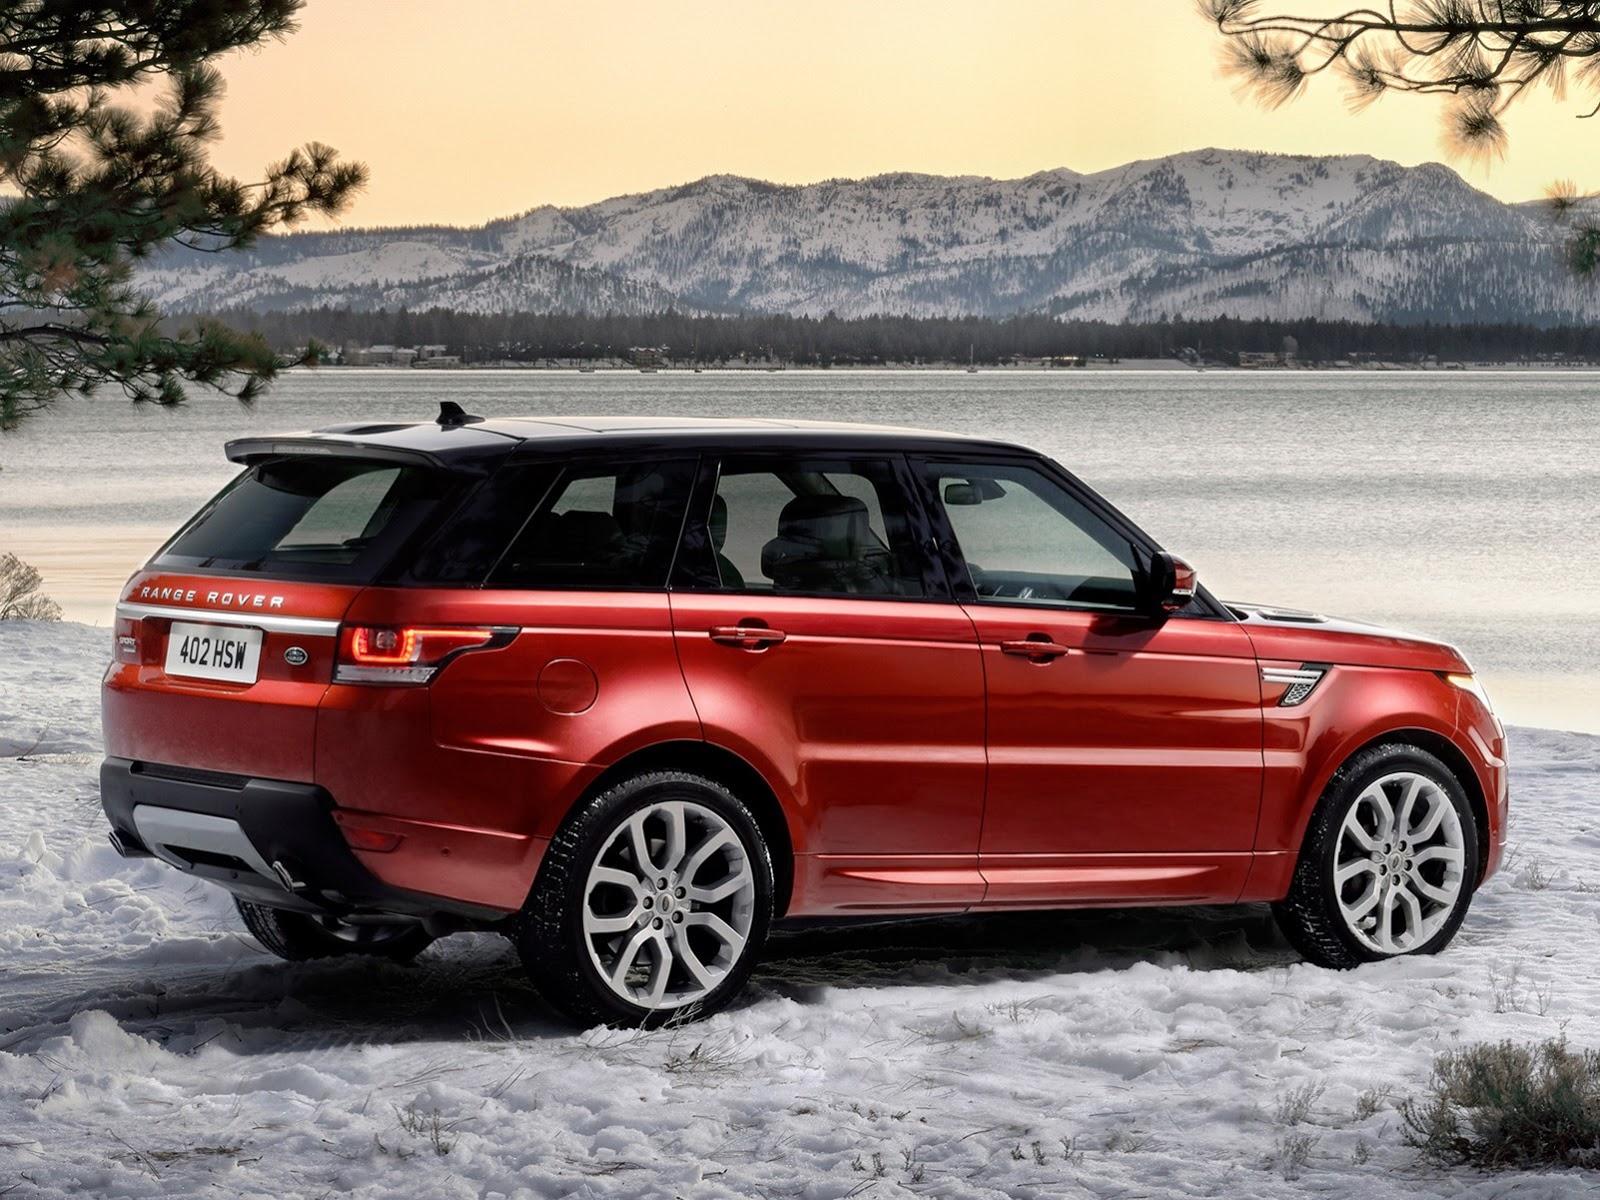 2014 range rover sport photo gallery car gallery premium luxury suvs autocar india. Black Bedroom Furniture Sets. Home Design Ideas